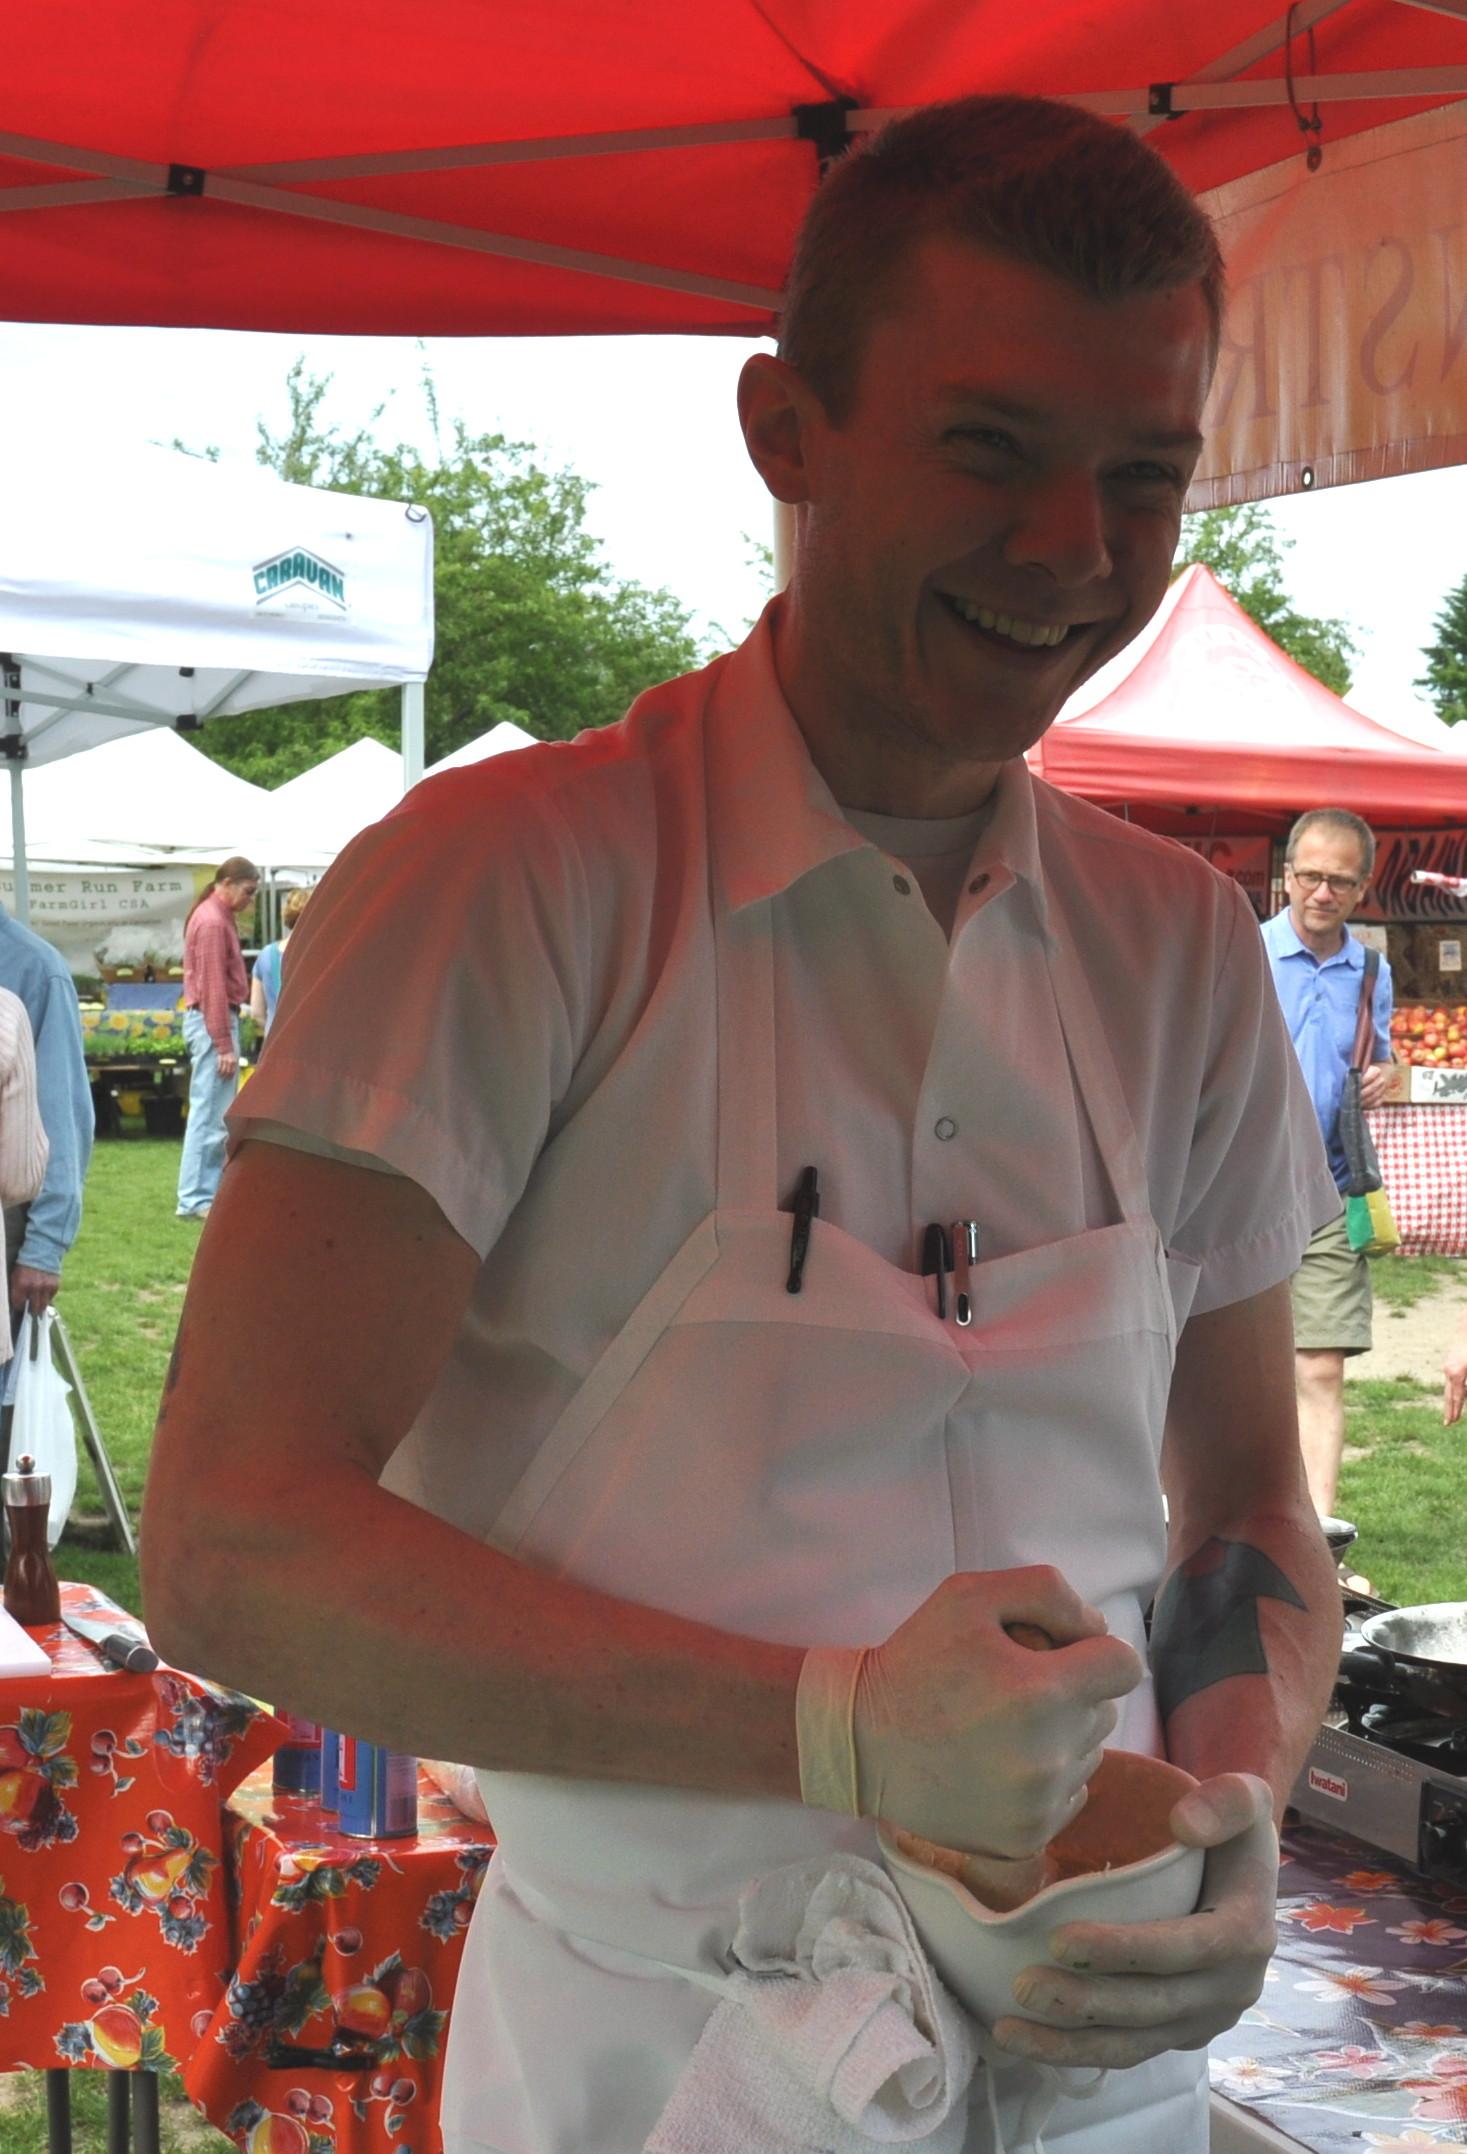 Chef Jason Brzozowy of Tilth Restaurant. Photo copyright 2013 by Zachary D. Lyons.